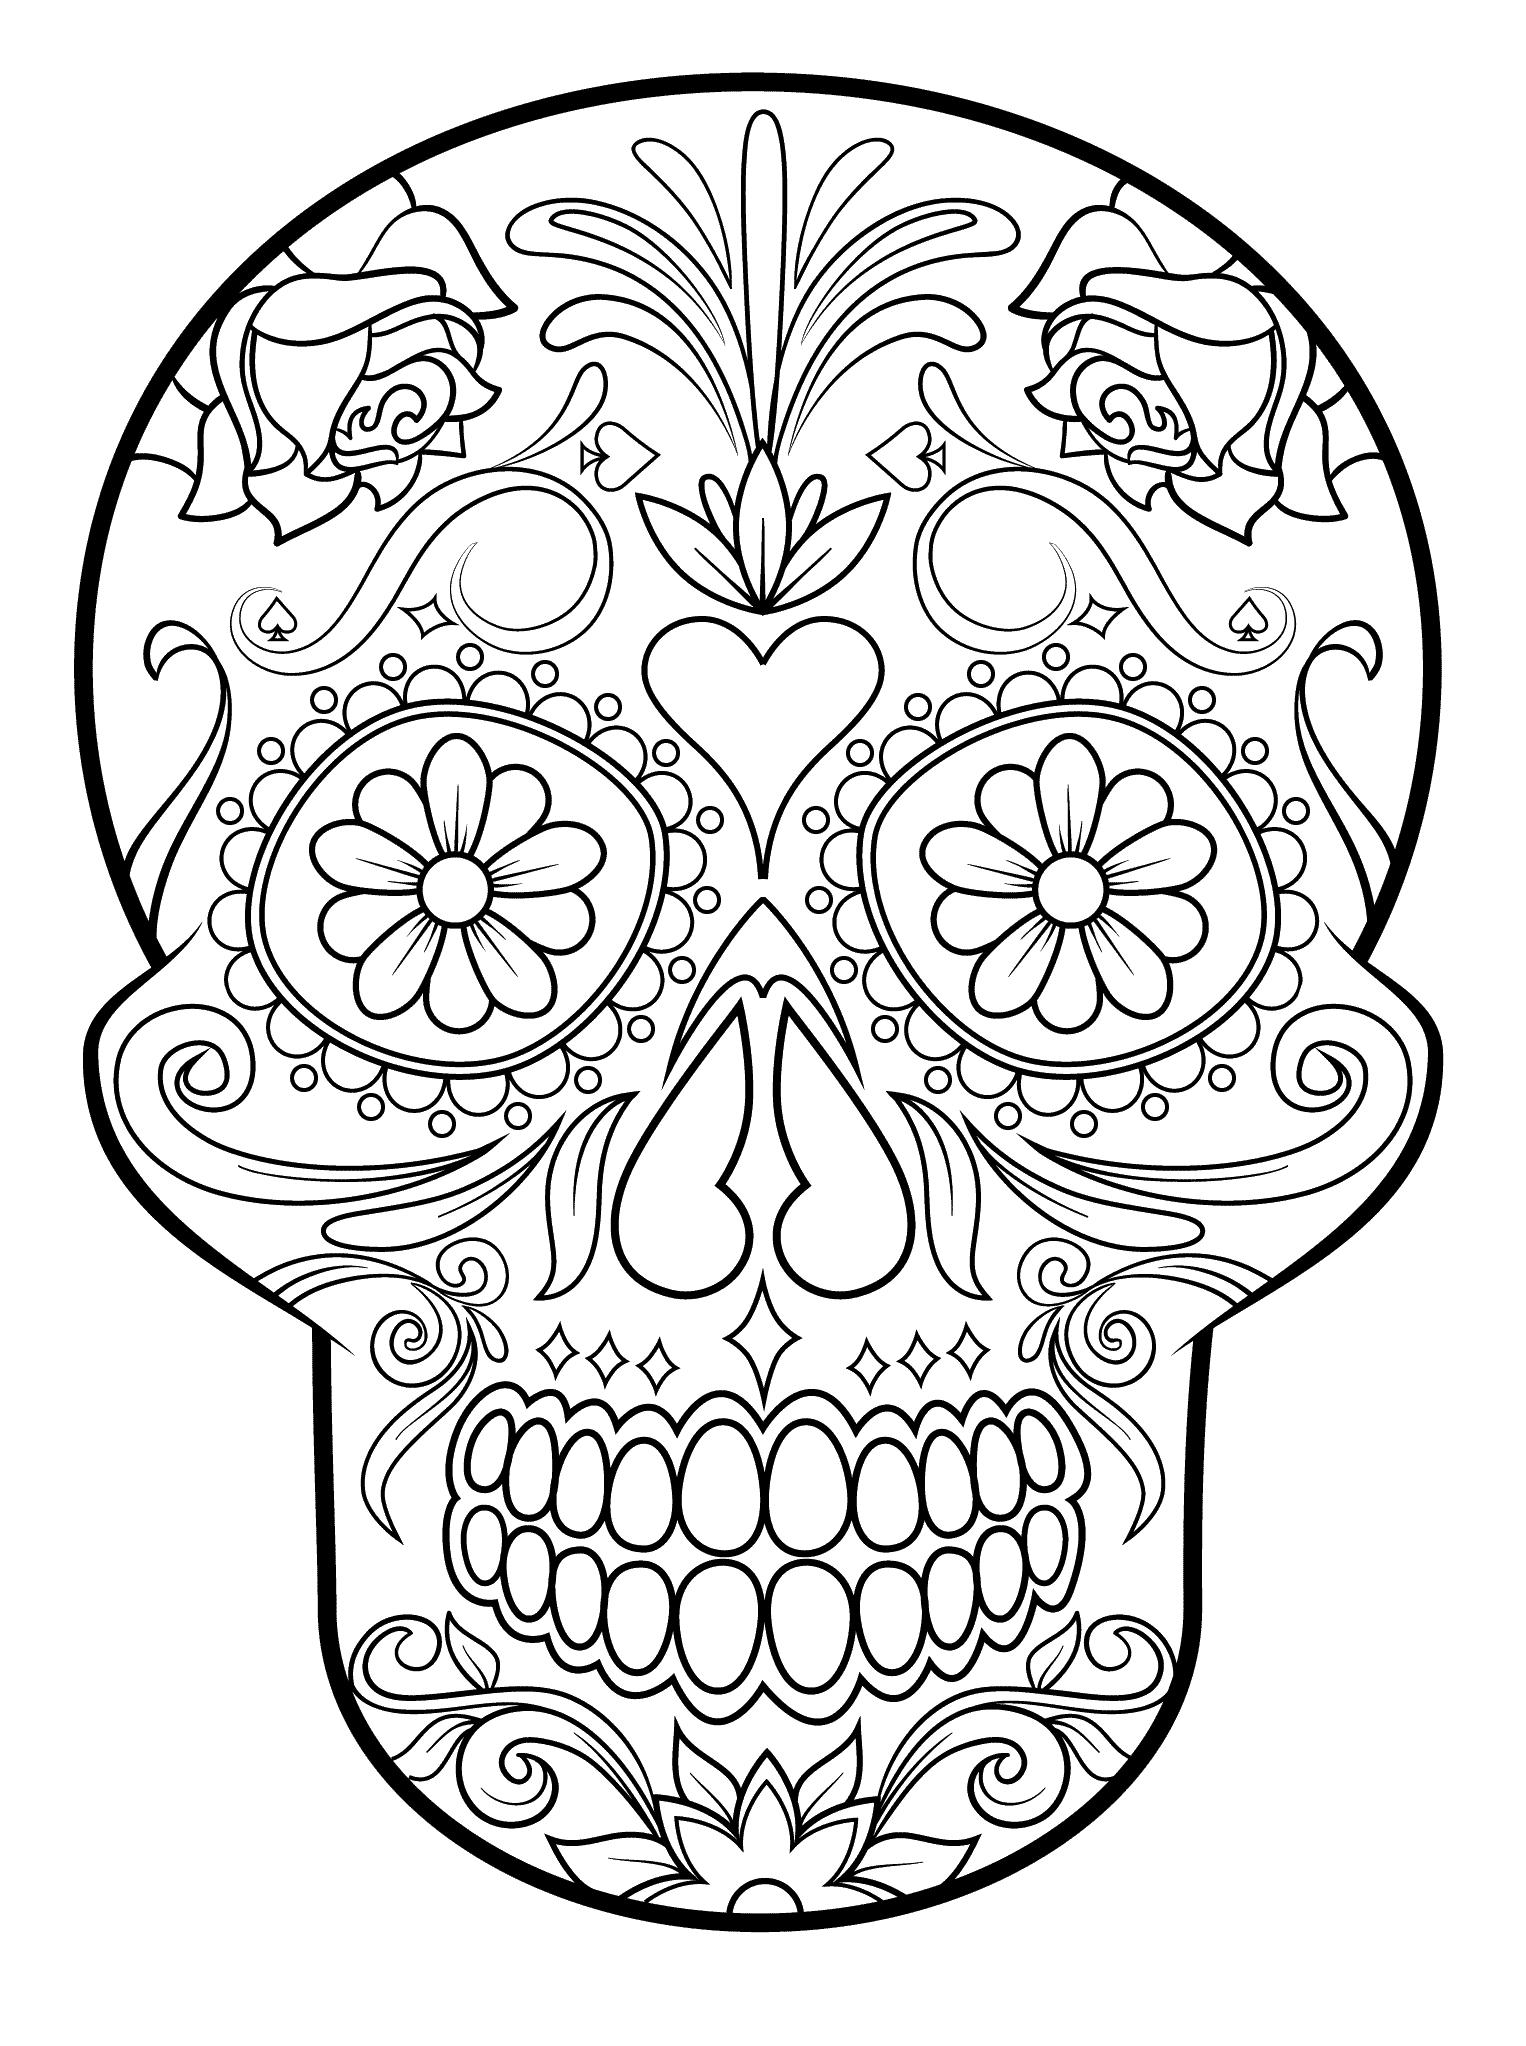 Mexican Mandala Coloring Book Dibujo De Calaveras Mexicanas Para